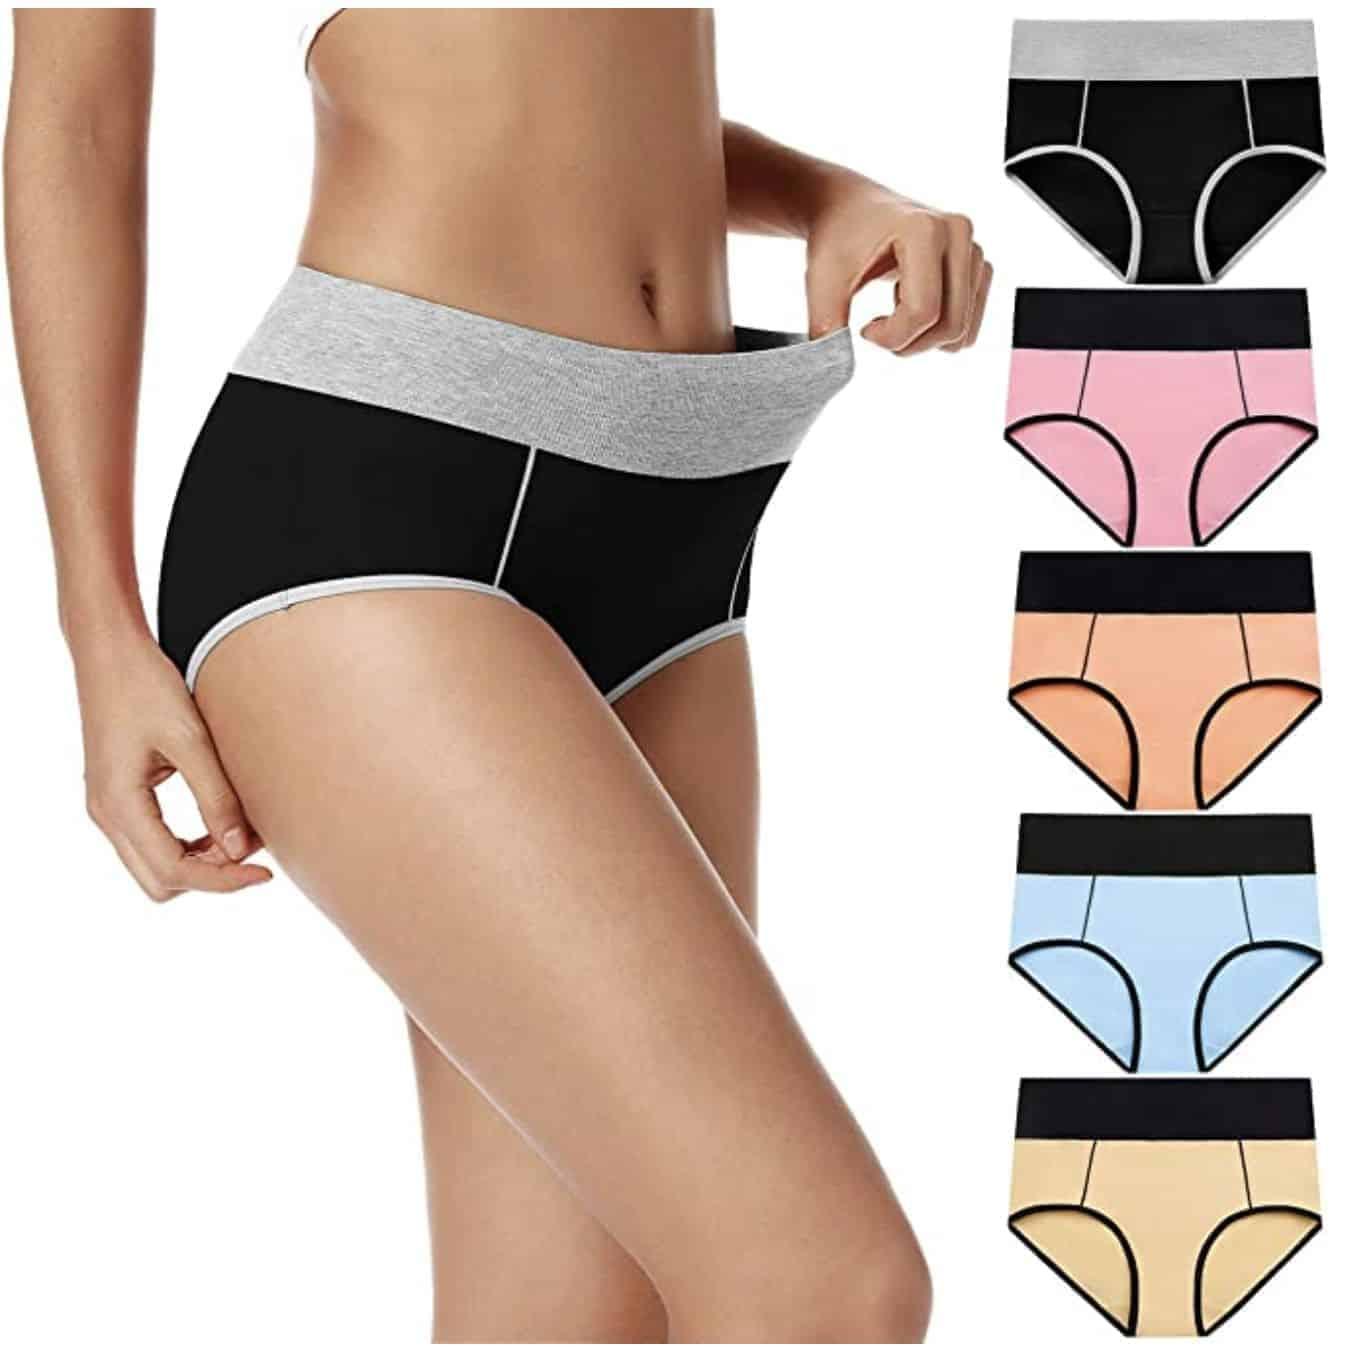 womens-boy-shorts-underwear